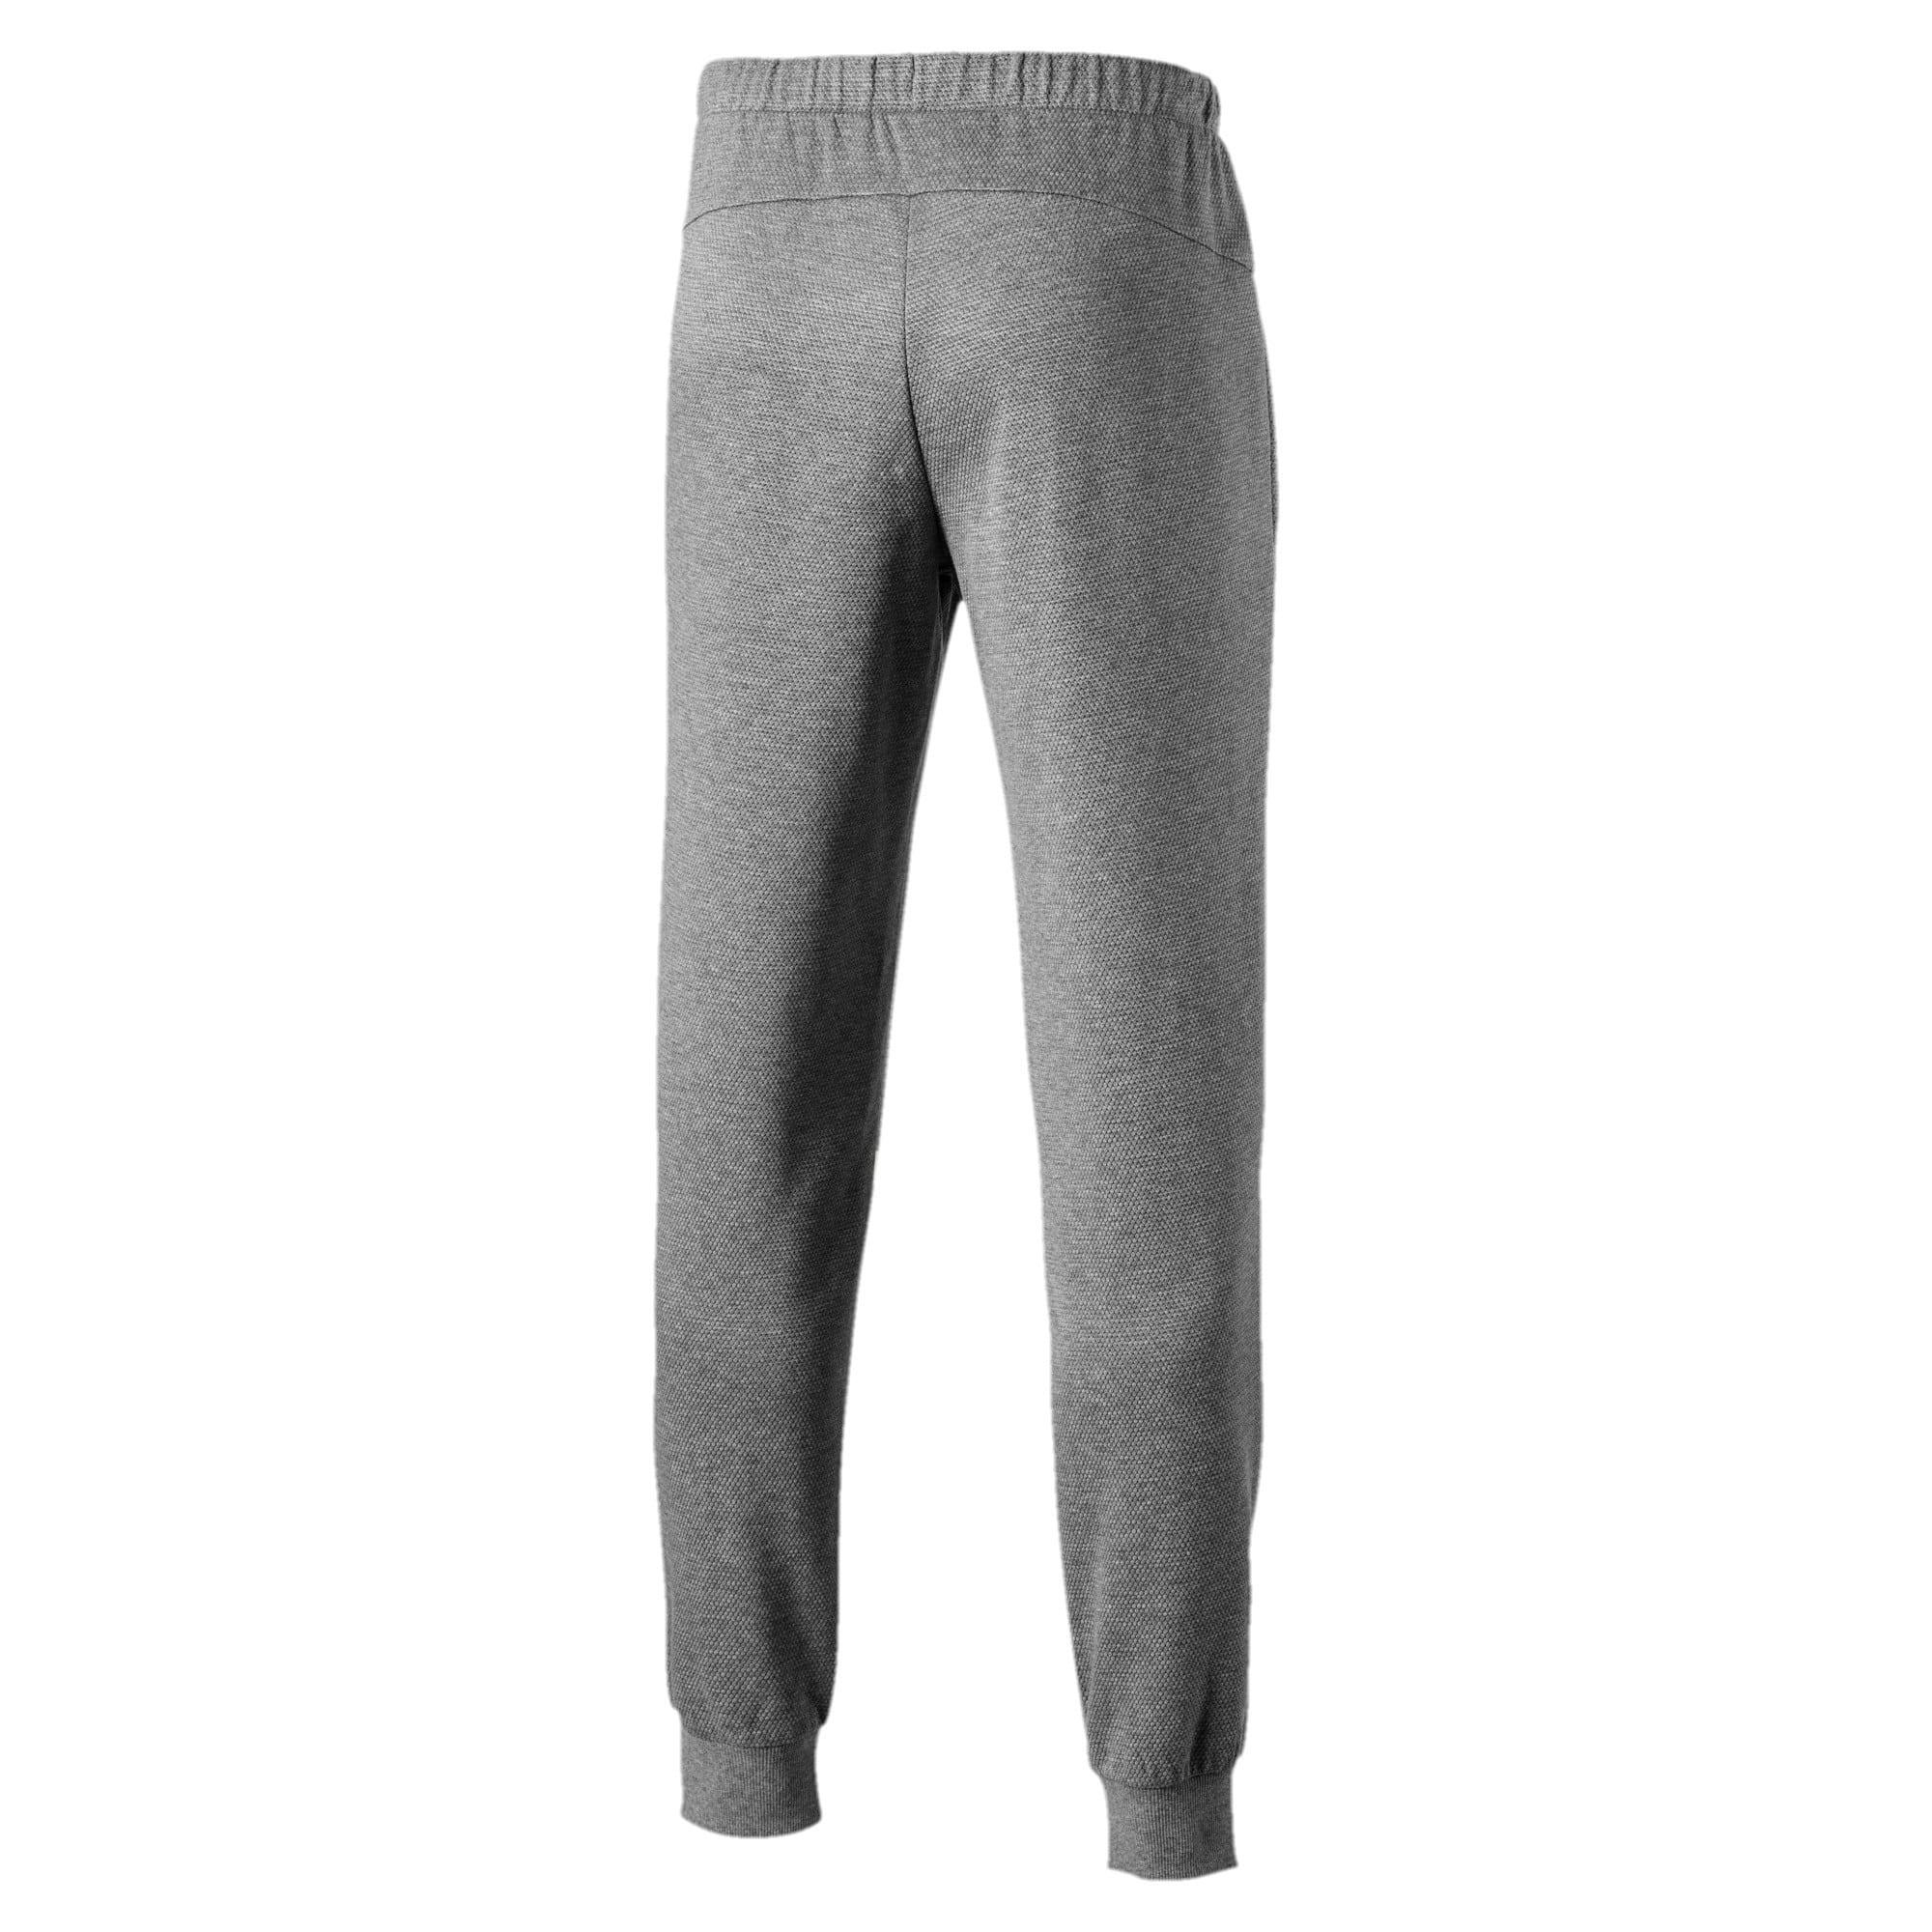 Thumbnail 5 of BMW Motorsport Knitted Men's Sweatpants, Medium Gray Heather, medium-IND